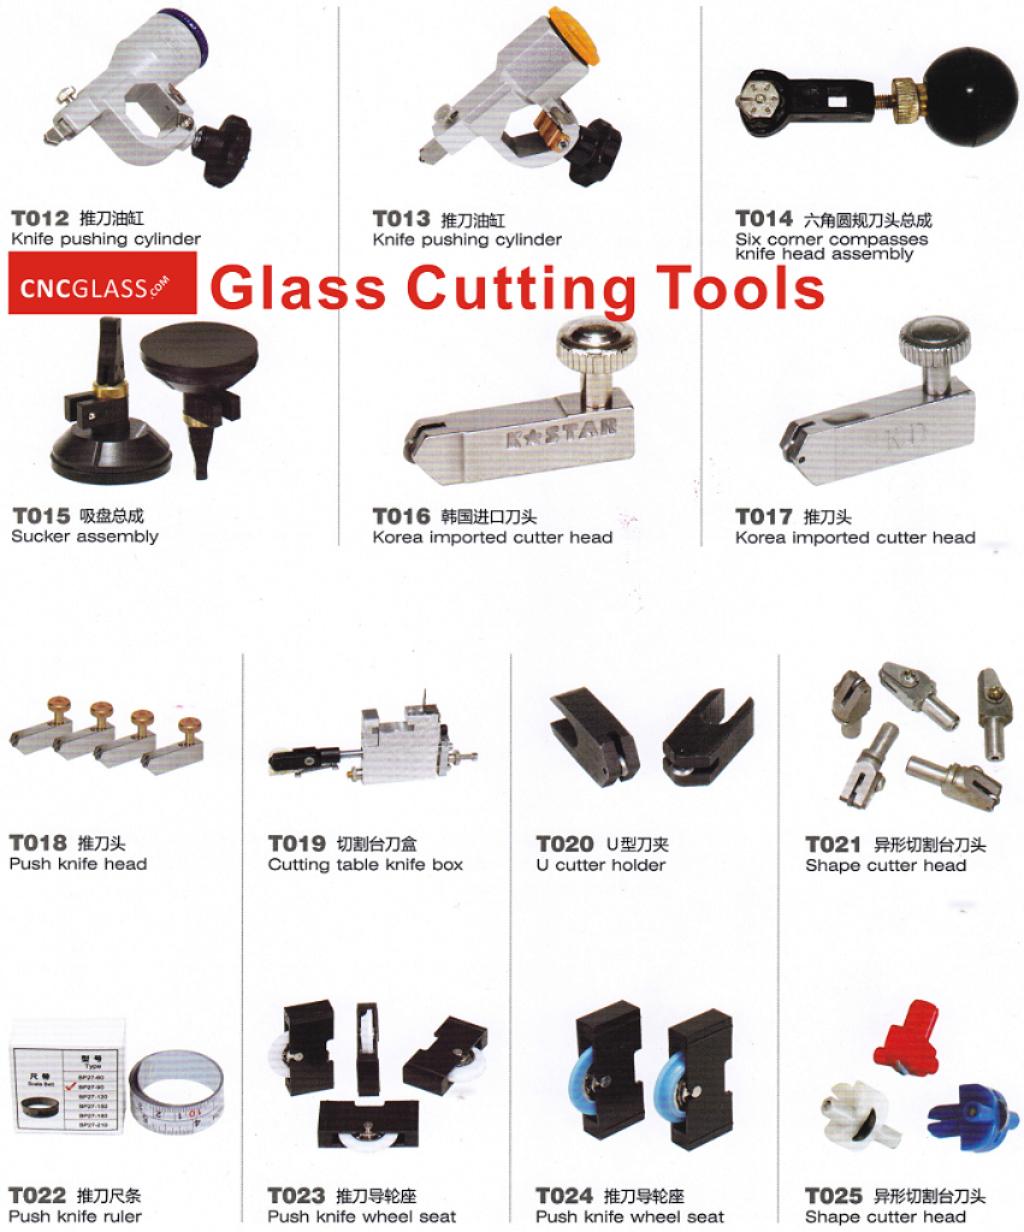 Glass Cutting Tools 2